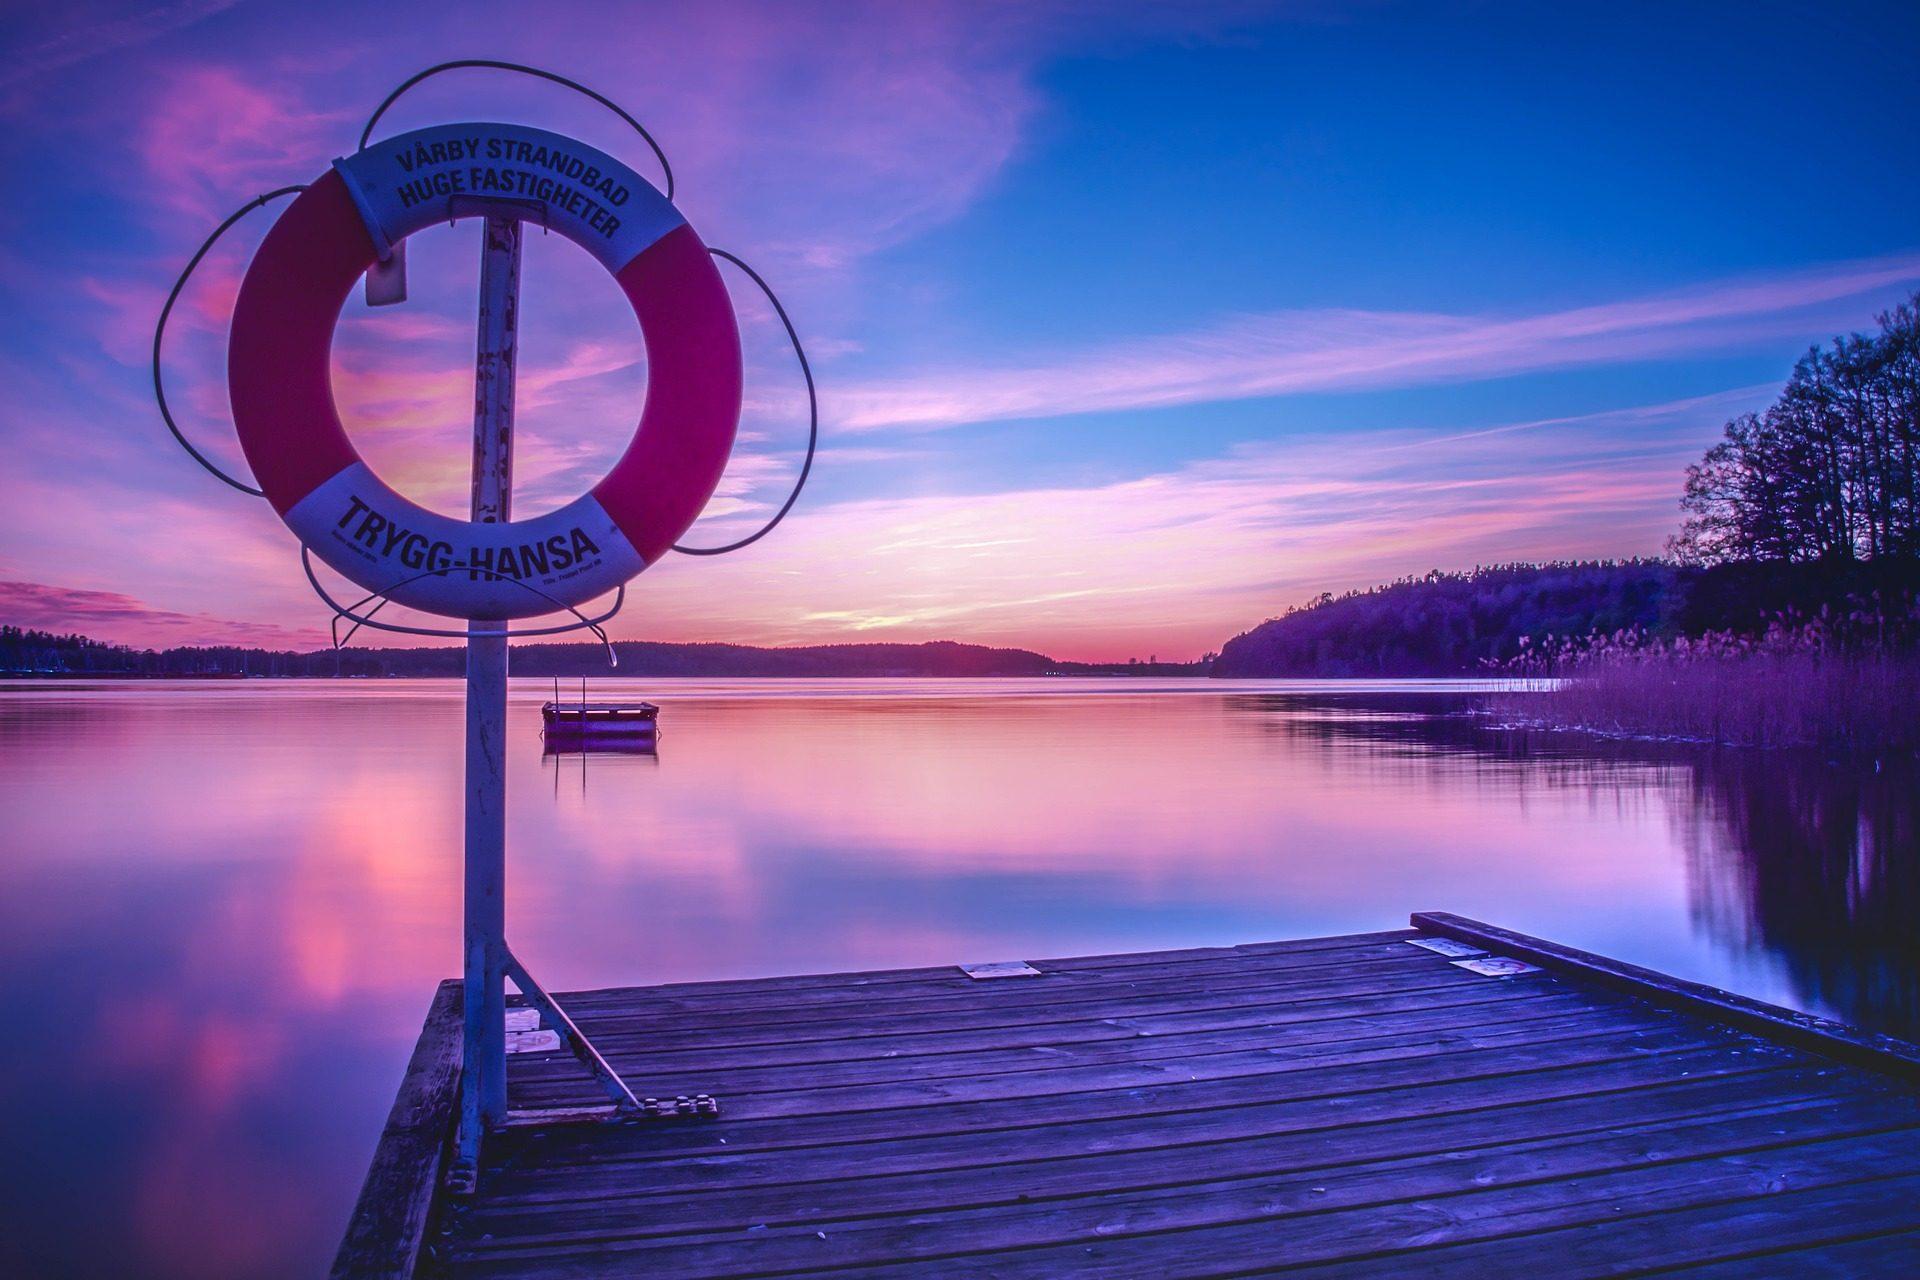 lago, muelle, salvavidas, flotador, barca, calma, serenidad - Fondos de Pantalla HD - professor-falken.com